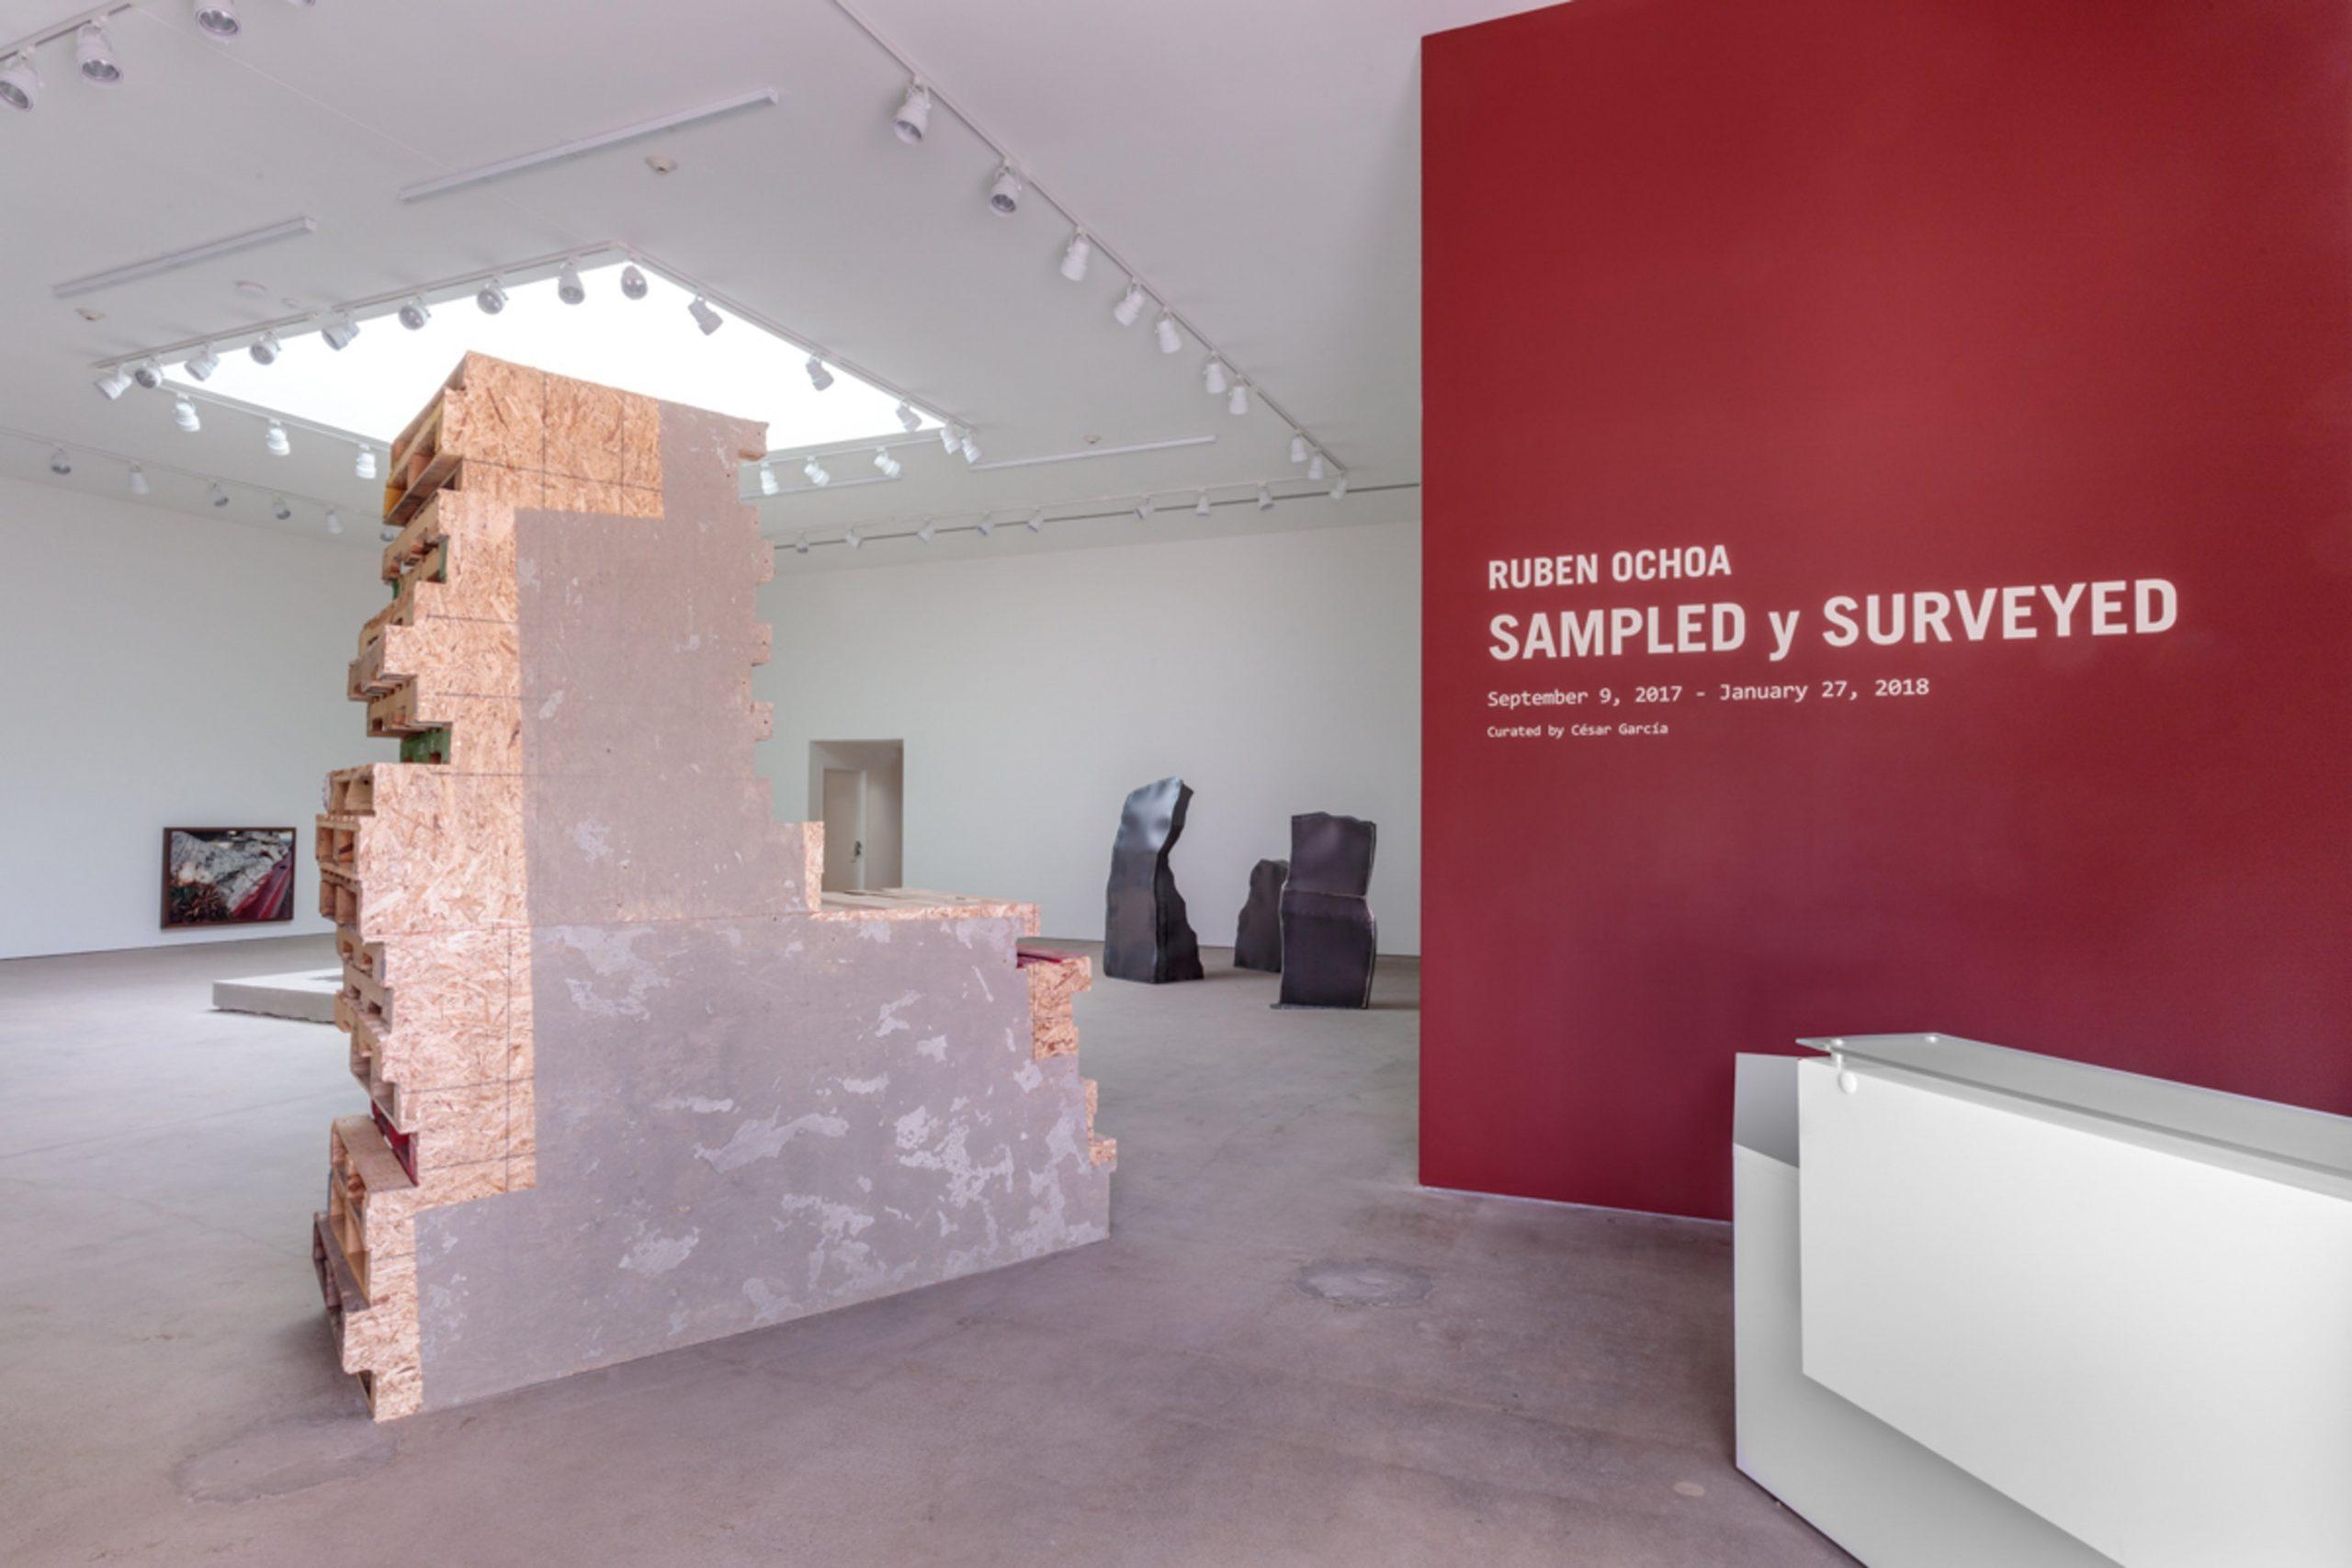 Ruben Ochoa: SAMPLED y SURVEYED at Art + Practice, Los Angeles. 9 September 2017 - 27 January 2018. Photo by Joshua White/JWPictures.com.